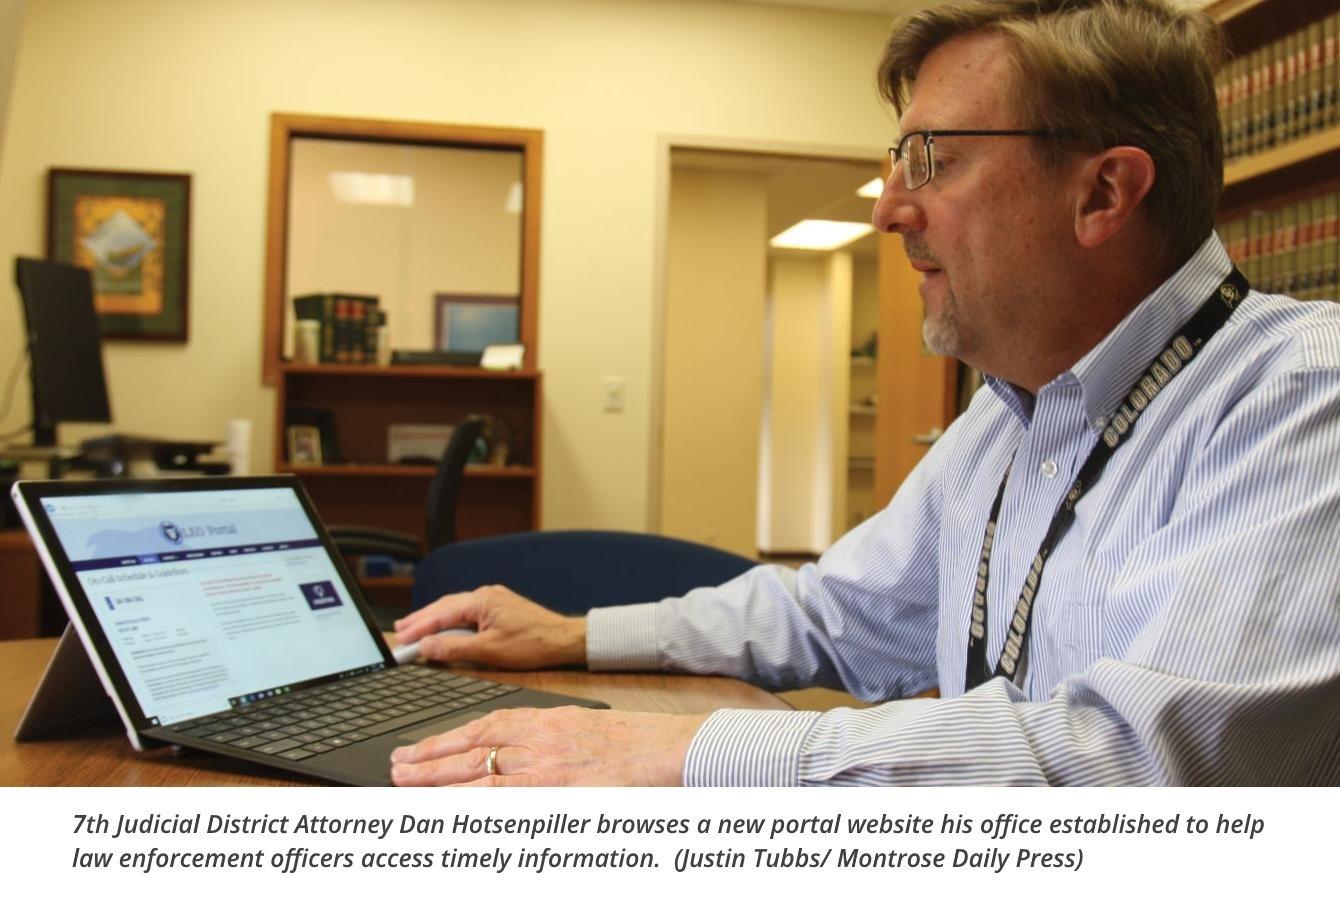 DA's Office Goes High-Tech For Officer Access – 7th Judicial